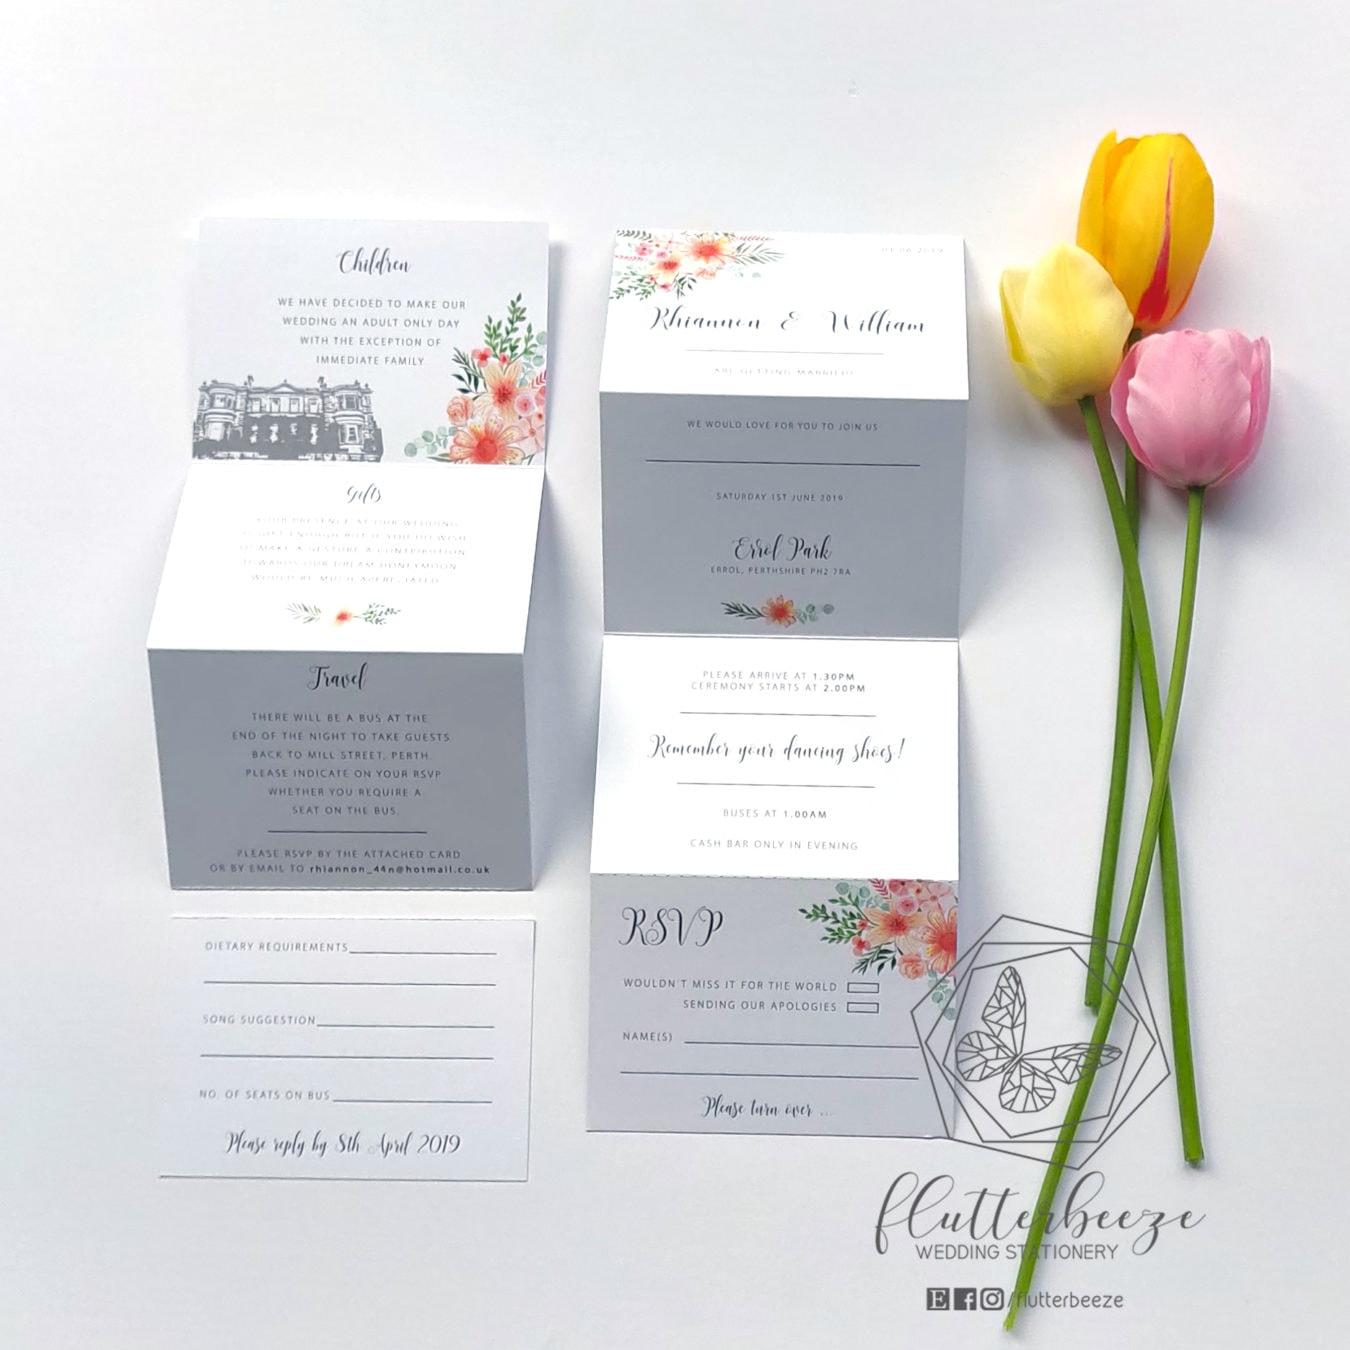 scottish-wedding-stationery-flutterbreeze-concertina